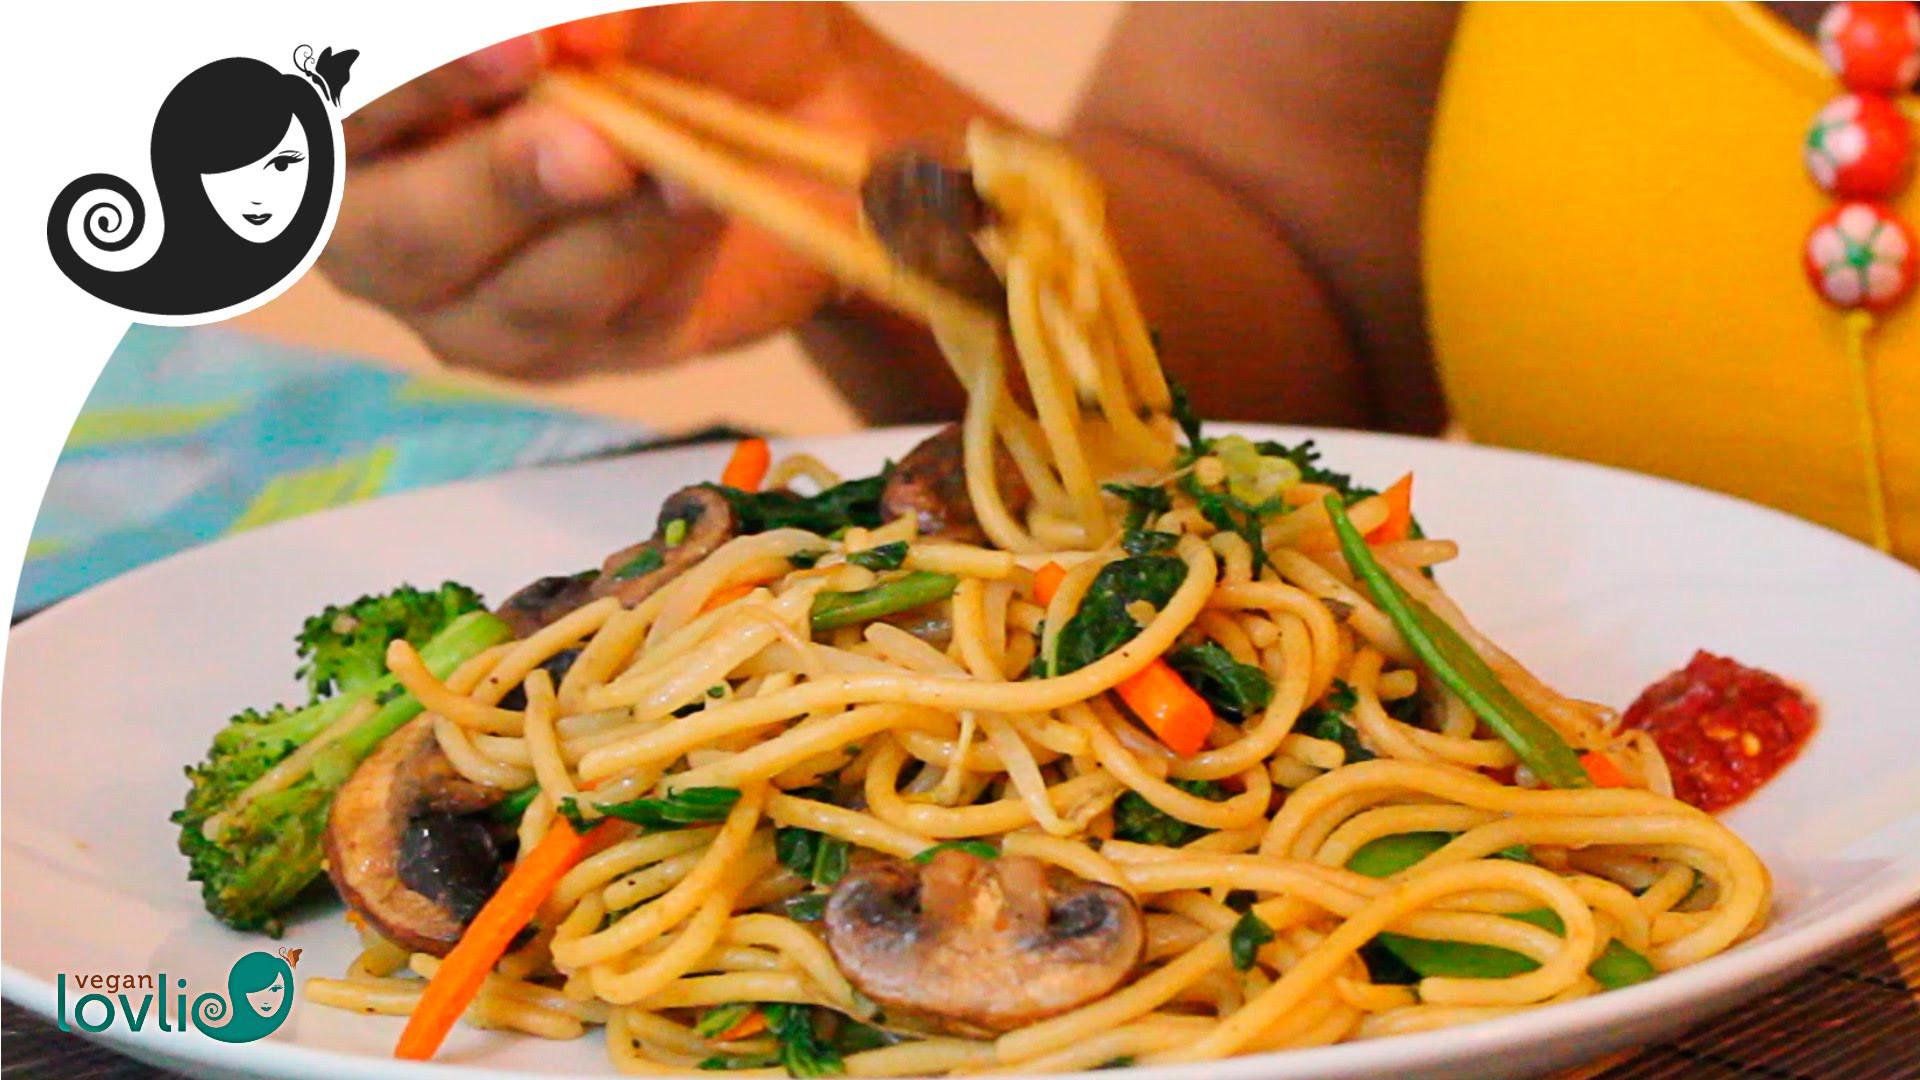 Stir Fry Spaghetti  Stir Fried Ve able Spaghetti Recipe ve arian vegan